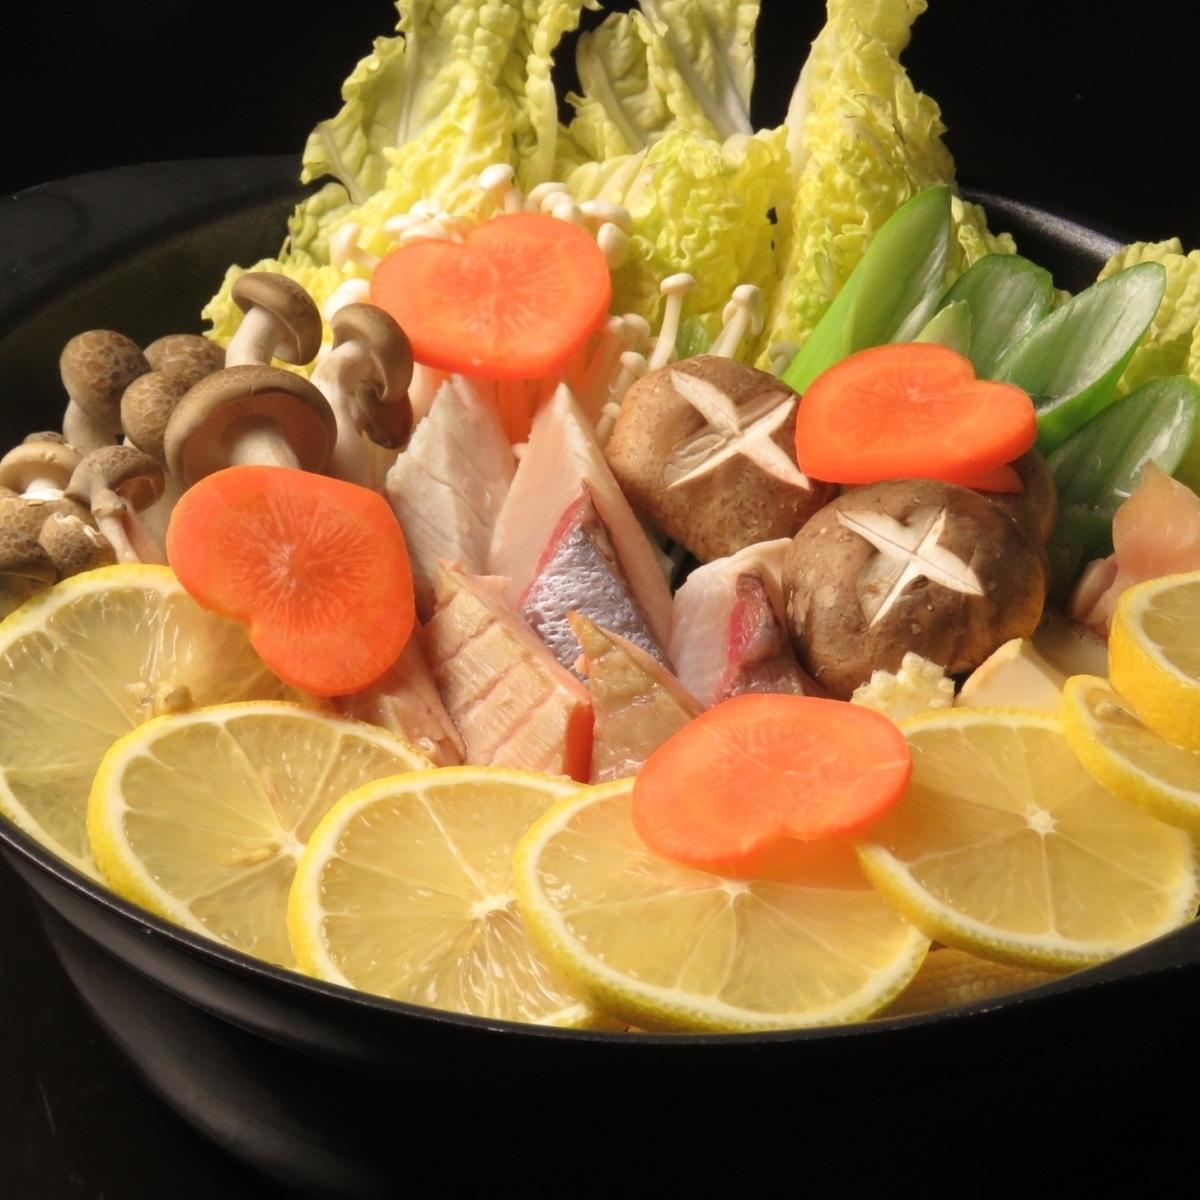 Lemon pot / water cooked